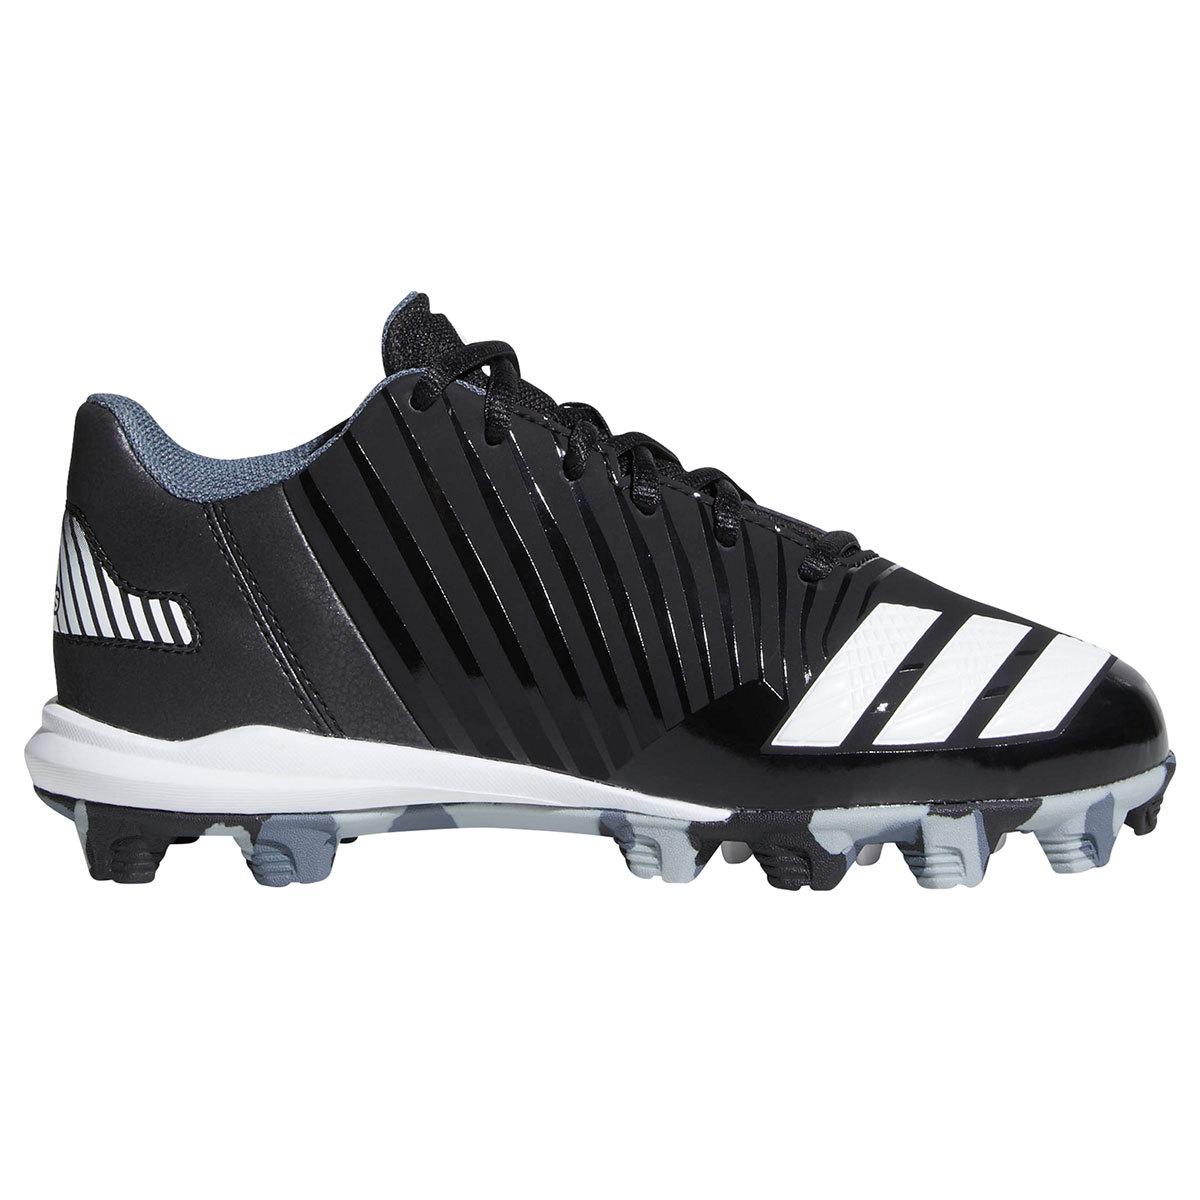 Adidas Kids' Icon Molded Baseball Cleats - Black, 12